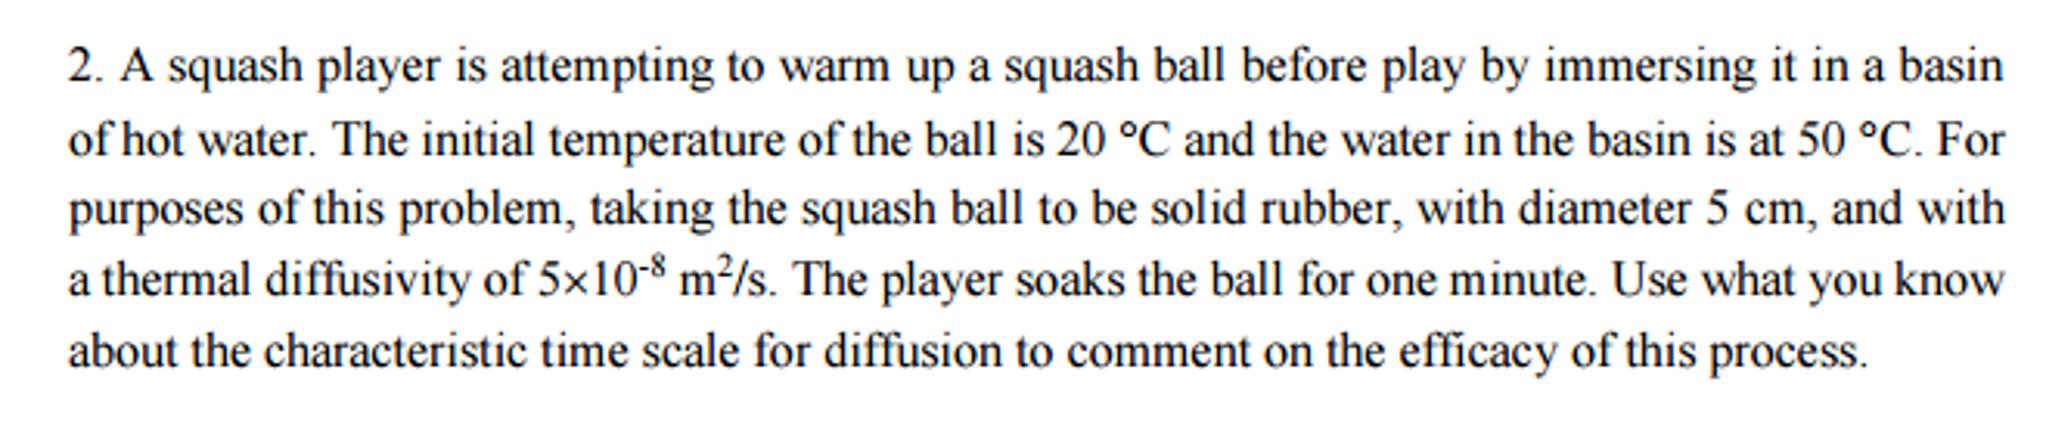 warm up squash ball